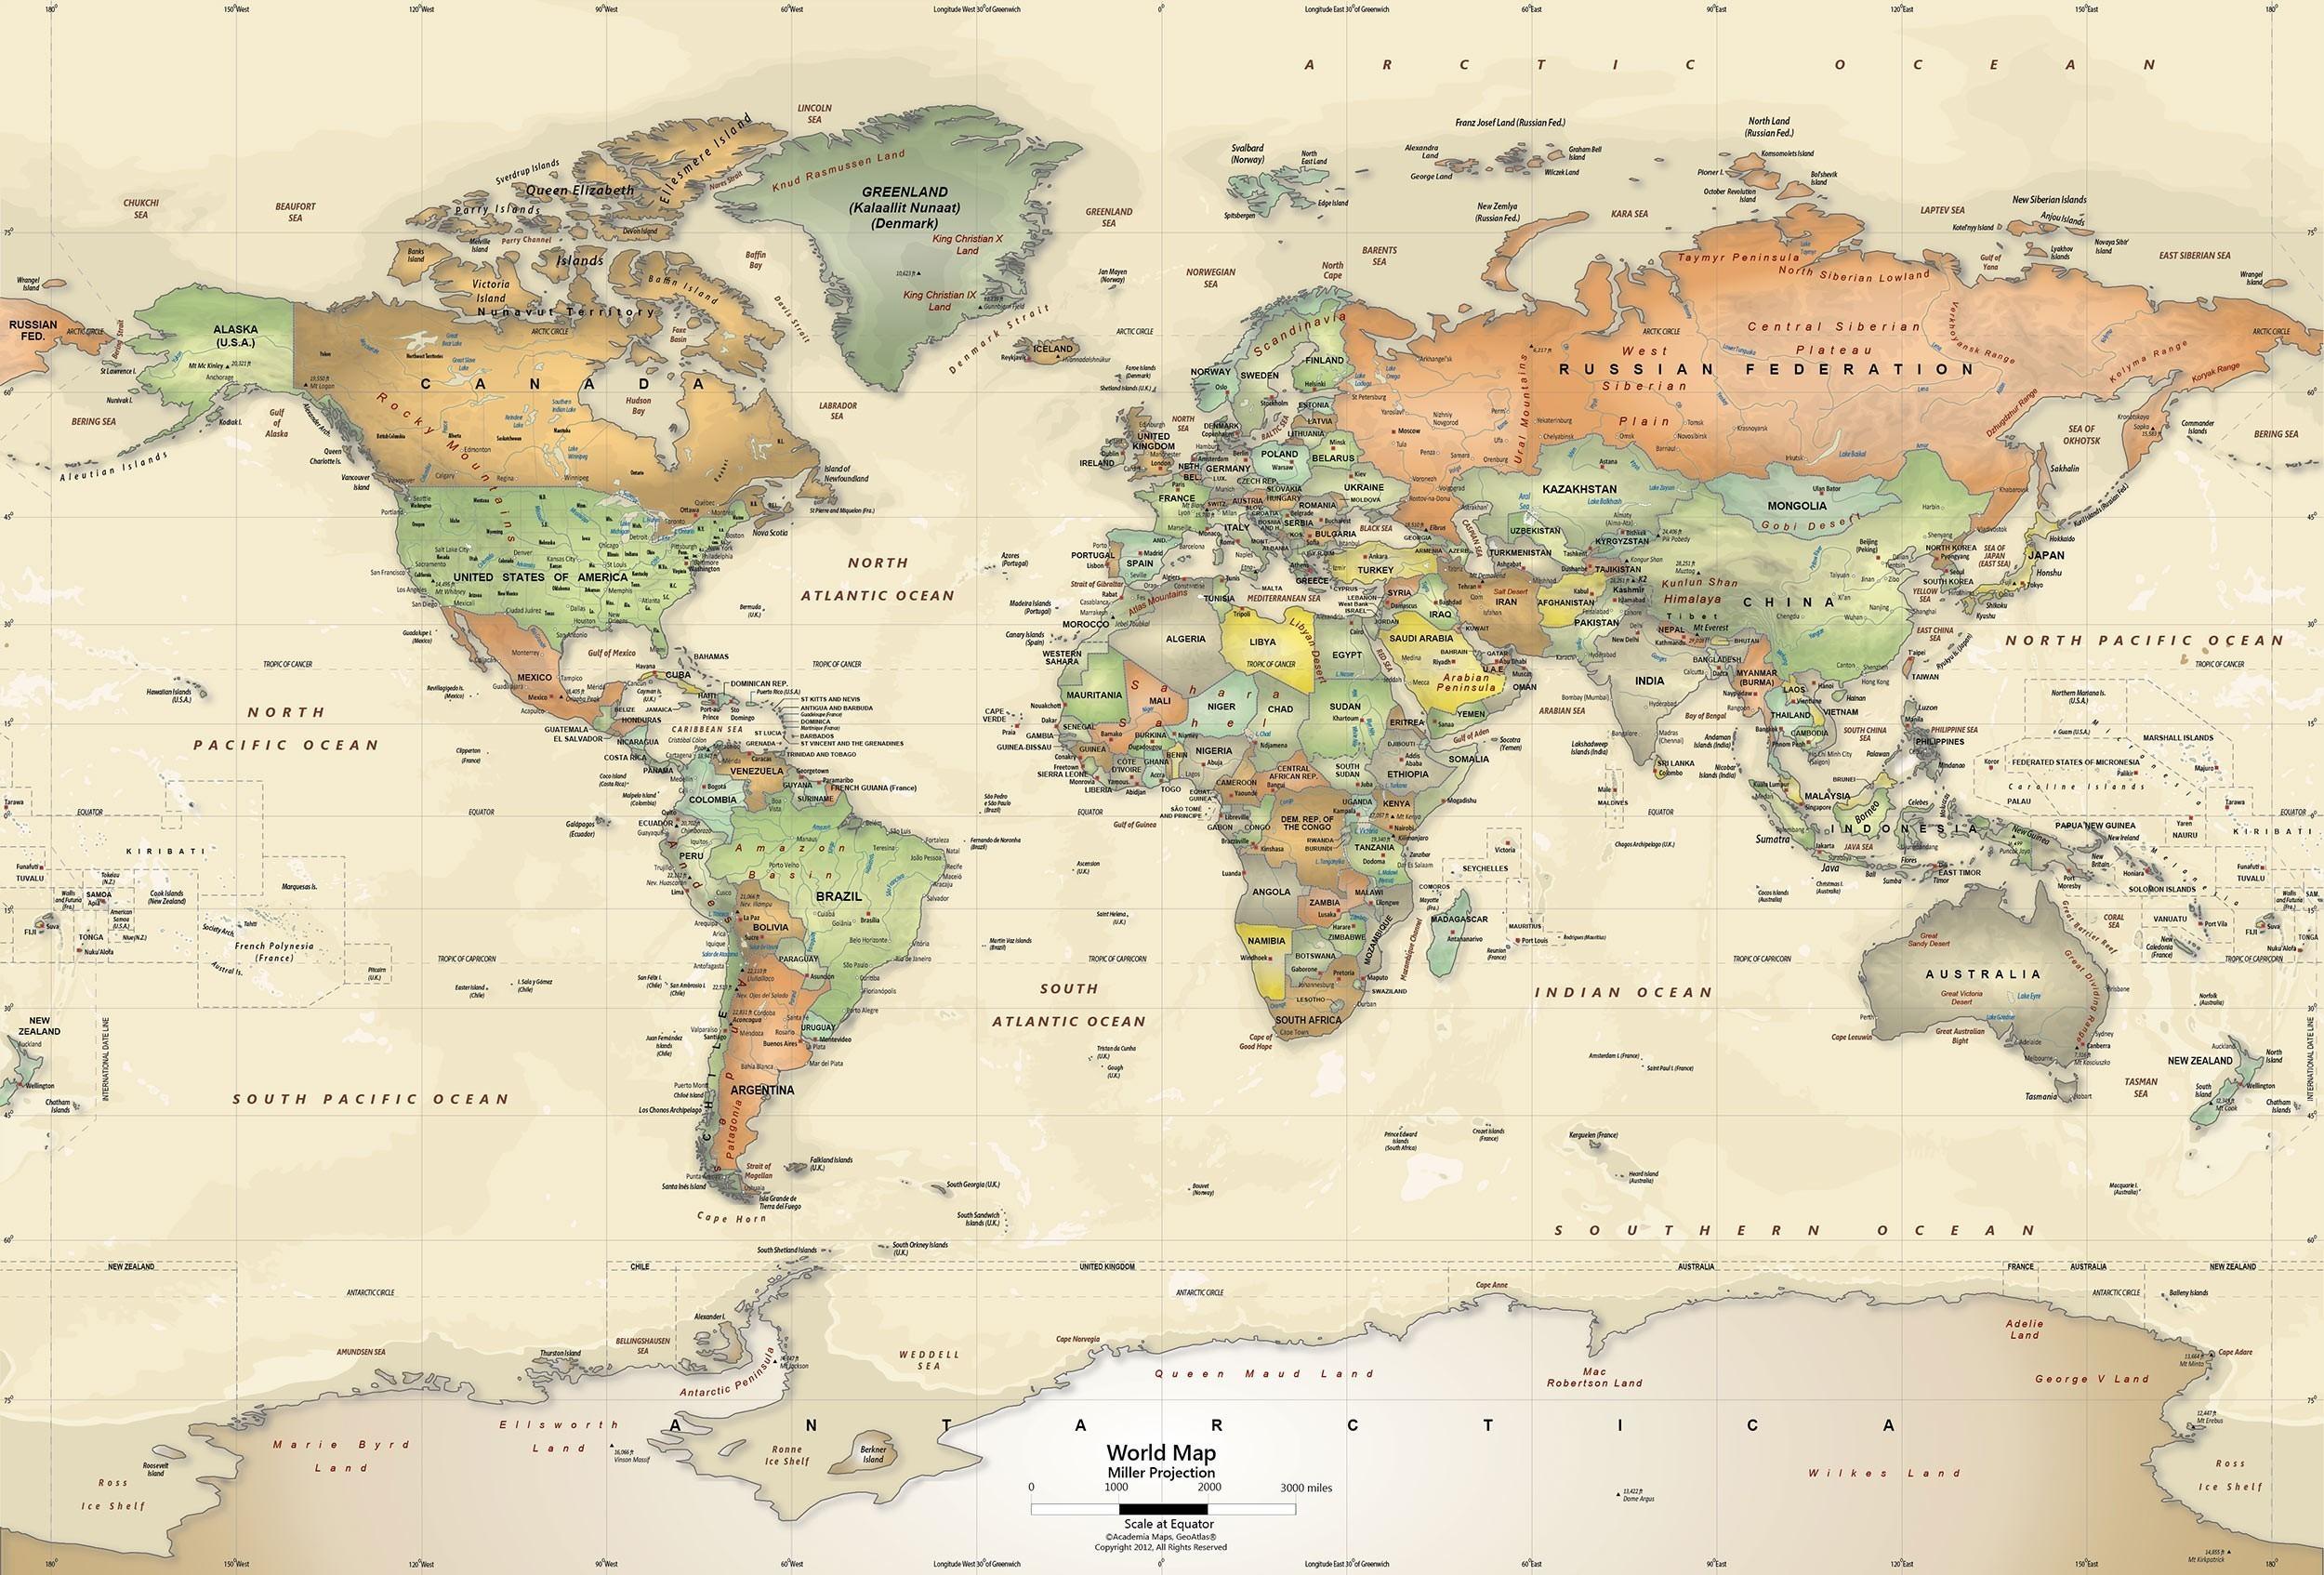 Res: 2500x1694, Blank Political World Map High Resolution Fresh World Map Wallpapers High  Resolution Wallpaper Cave With Hd Valid Blank Political World Map High  Resolution ...